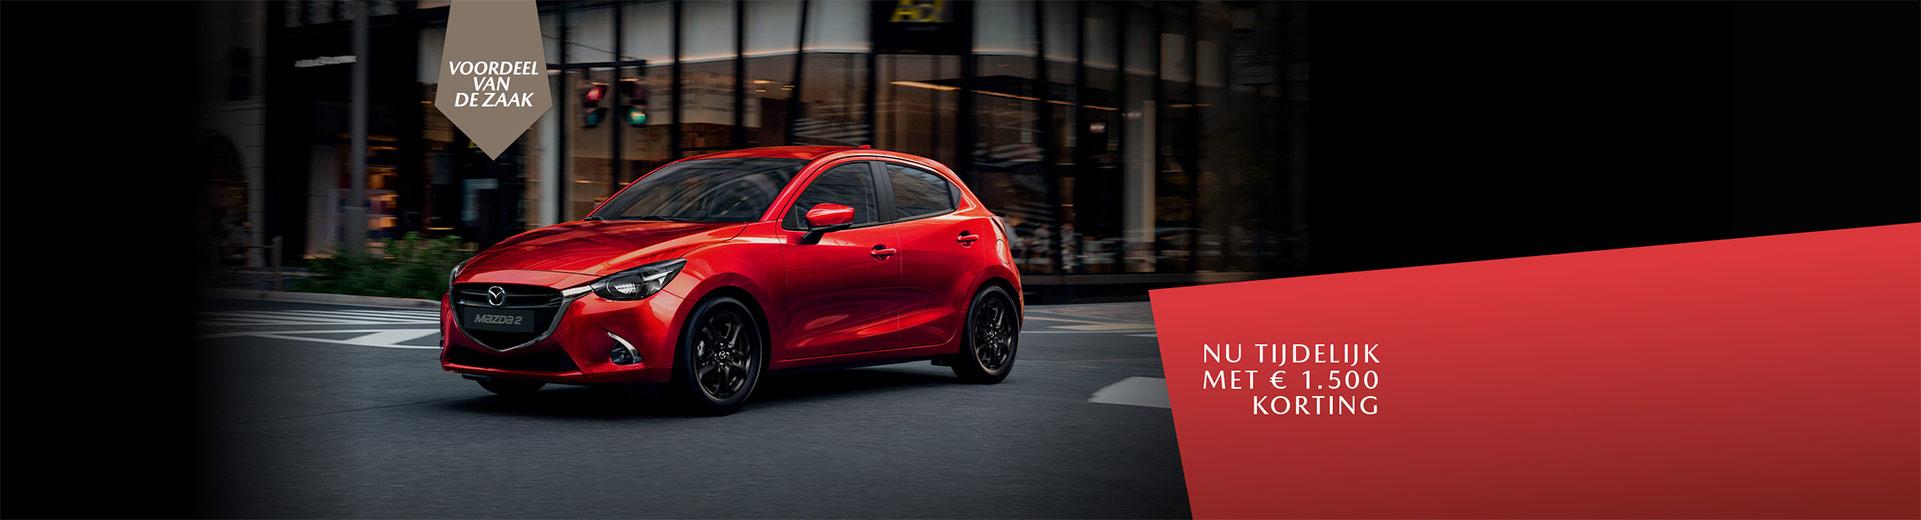 Banner vernieuwde Mazda2